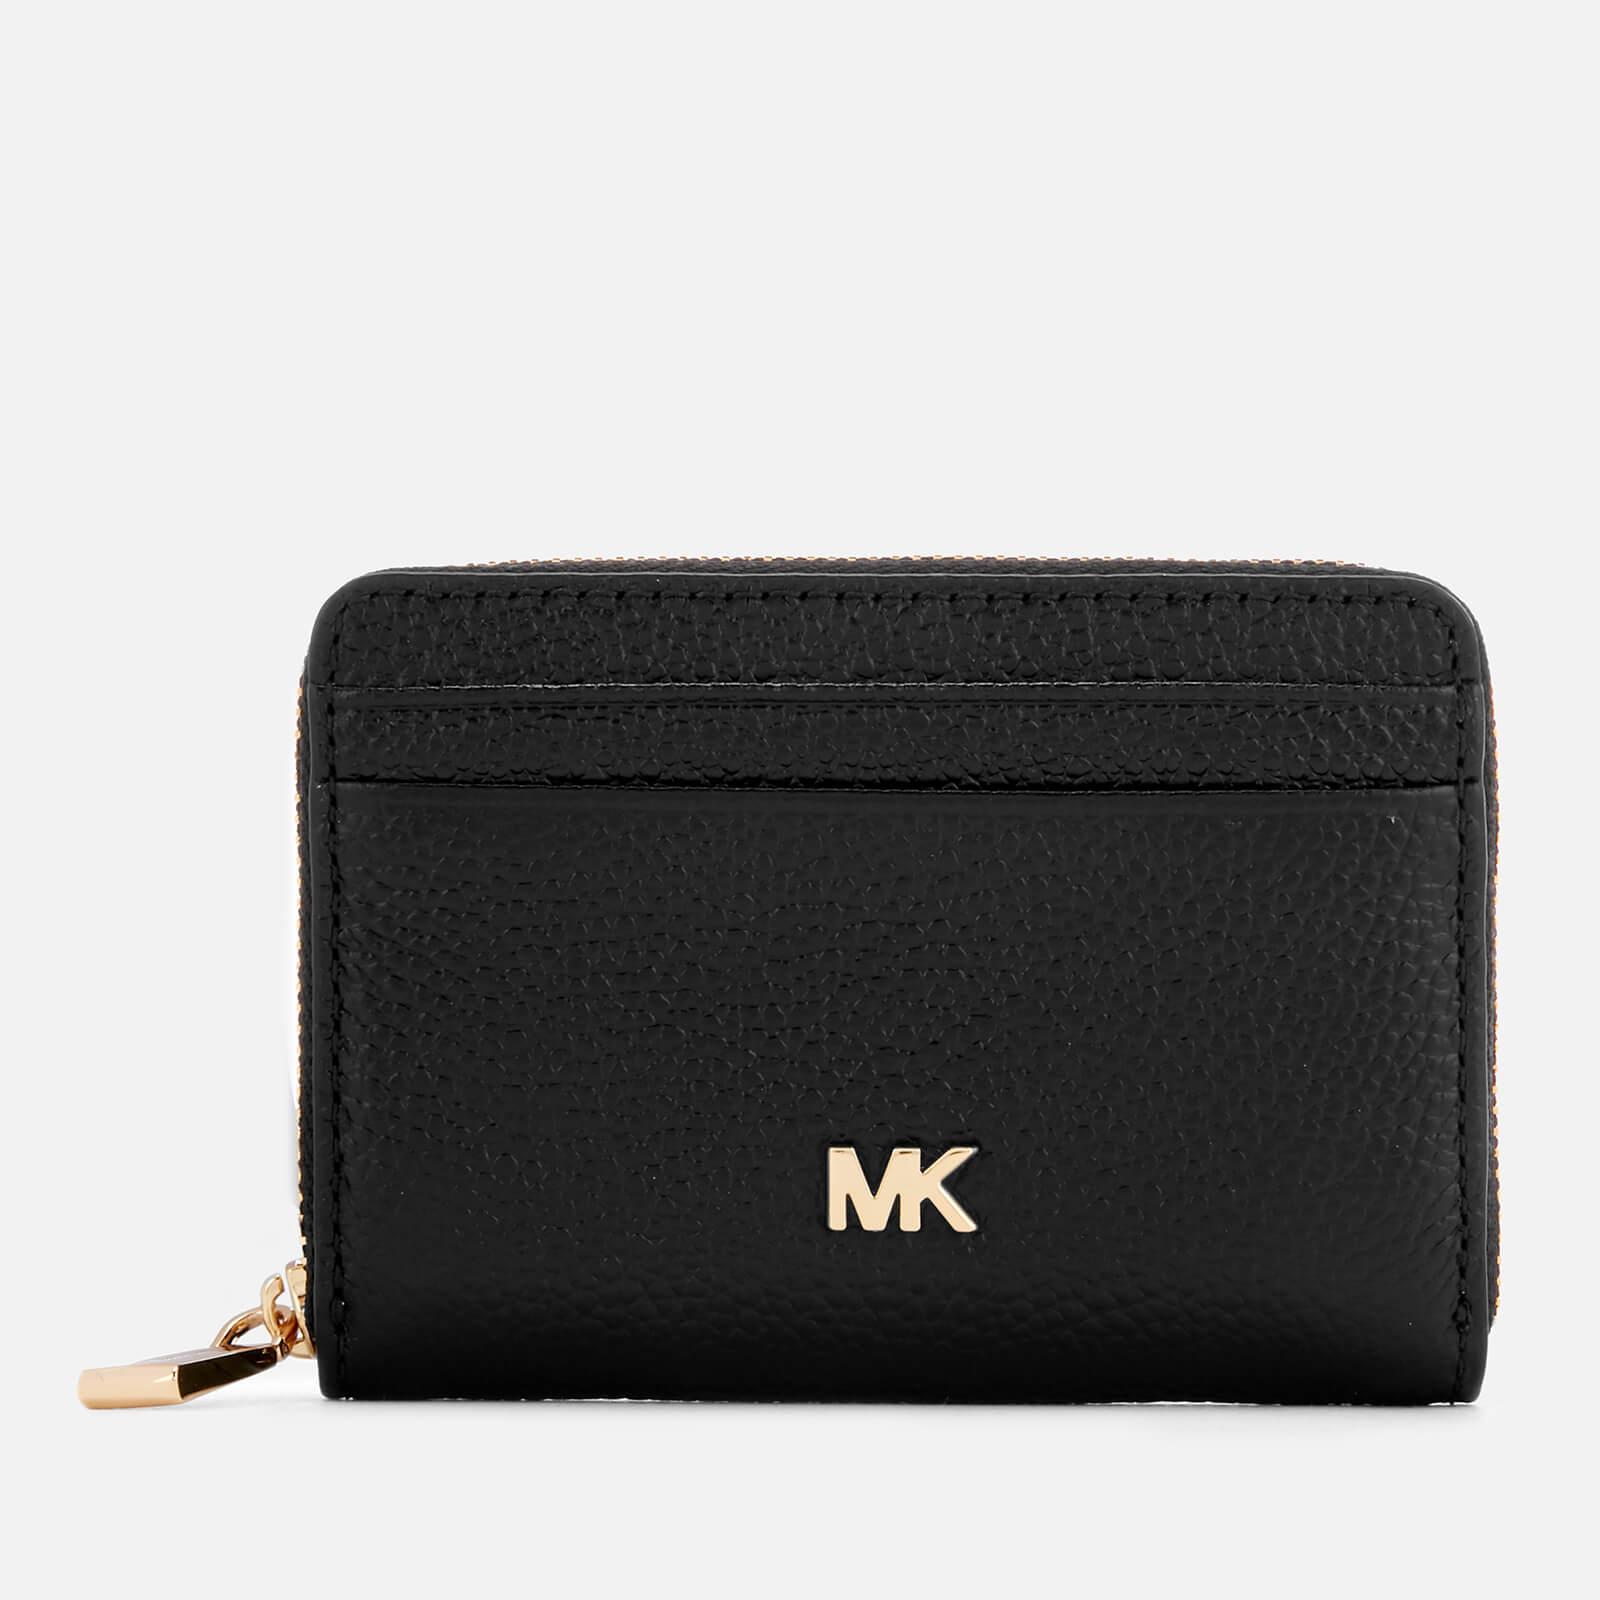 MICHAEL MICHAEL KORS Women's Money Pieces Zip Around Coin Card Case - Black